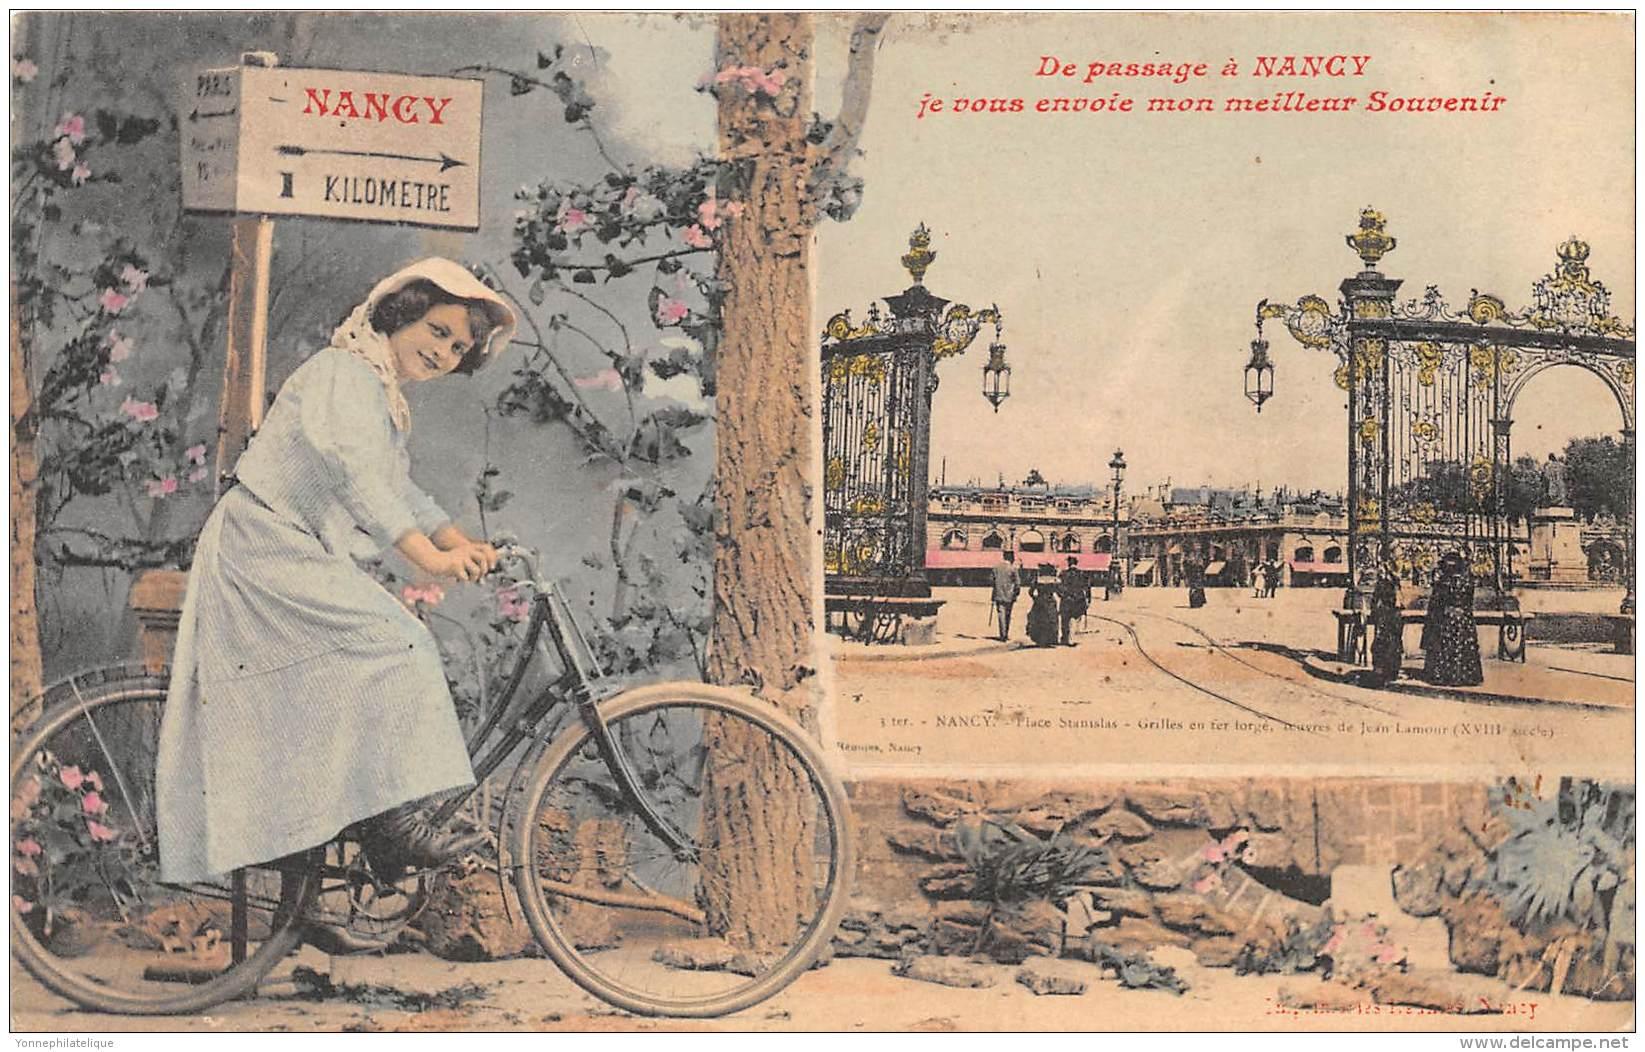 54 - MEURTHE ET MOSELLE / Nancy - 544922 - Belle Carte Fantaisie - Nancy